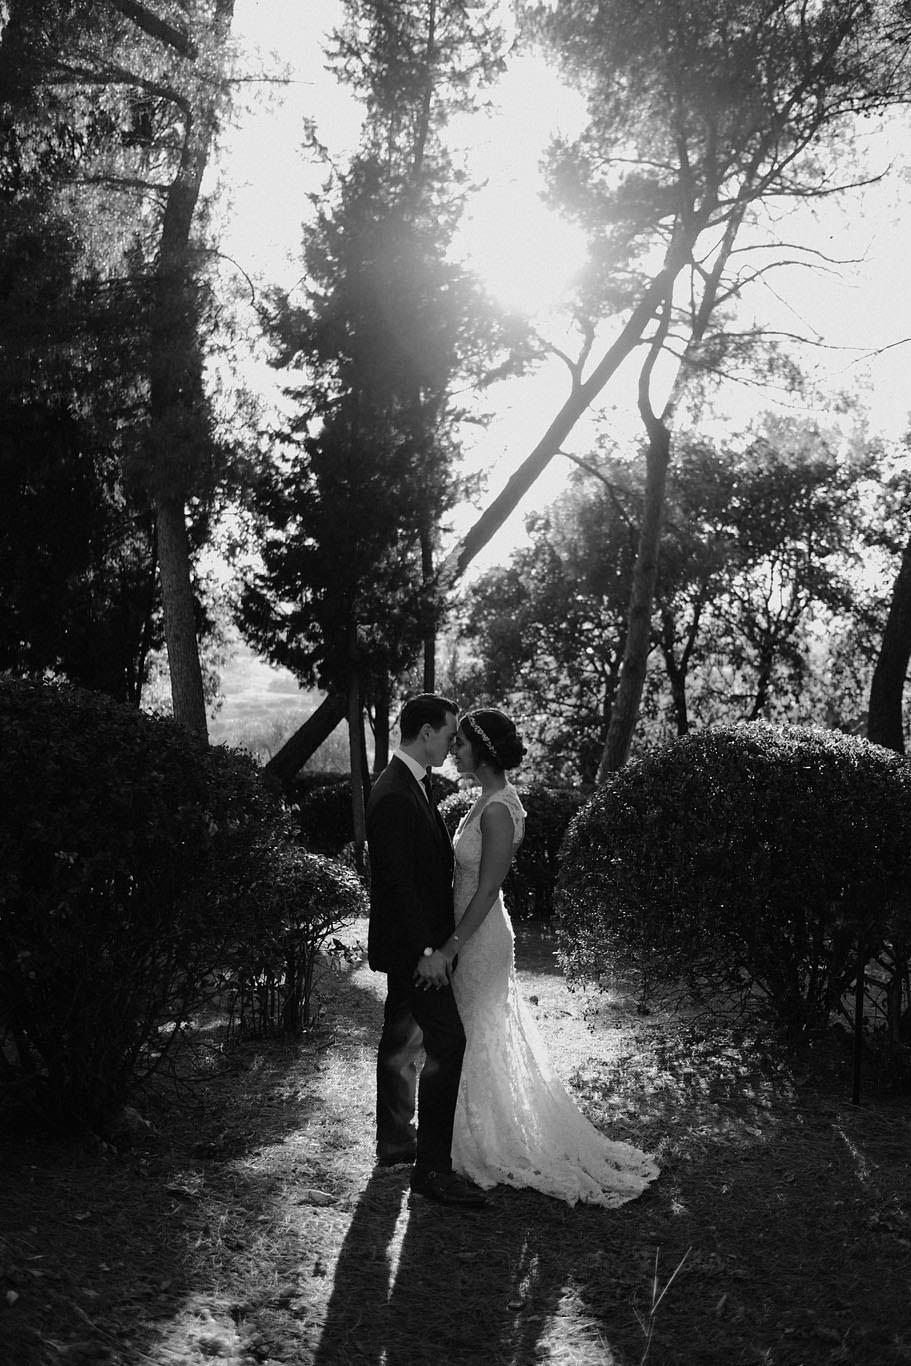 Max-Steph-Italy-Wedding-524.jpg